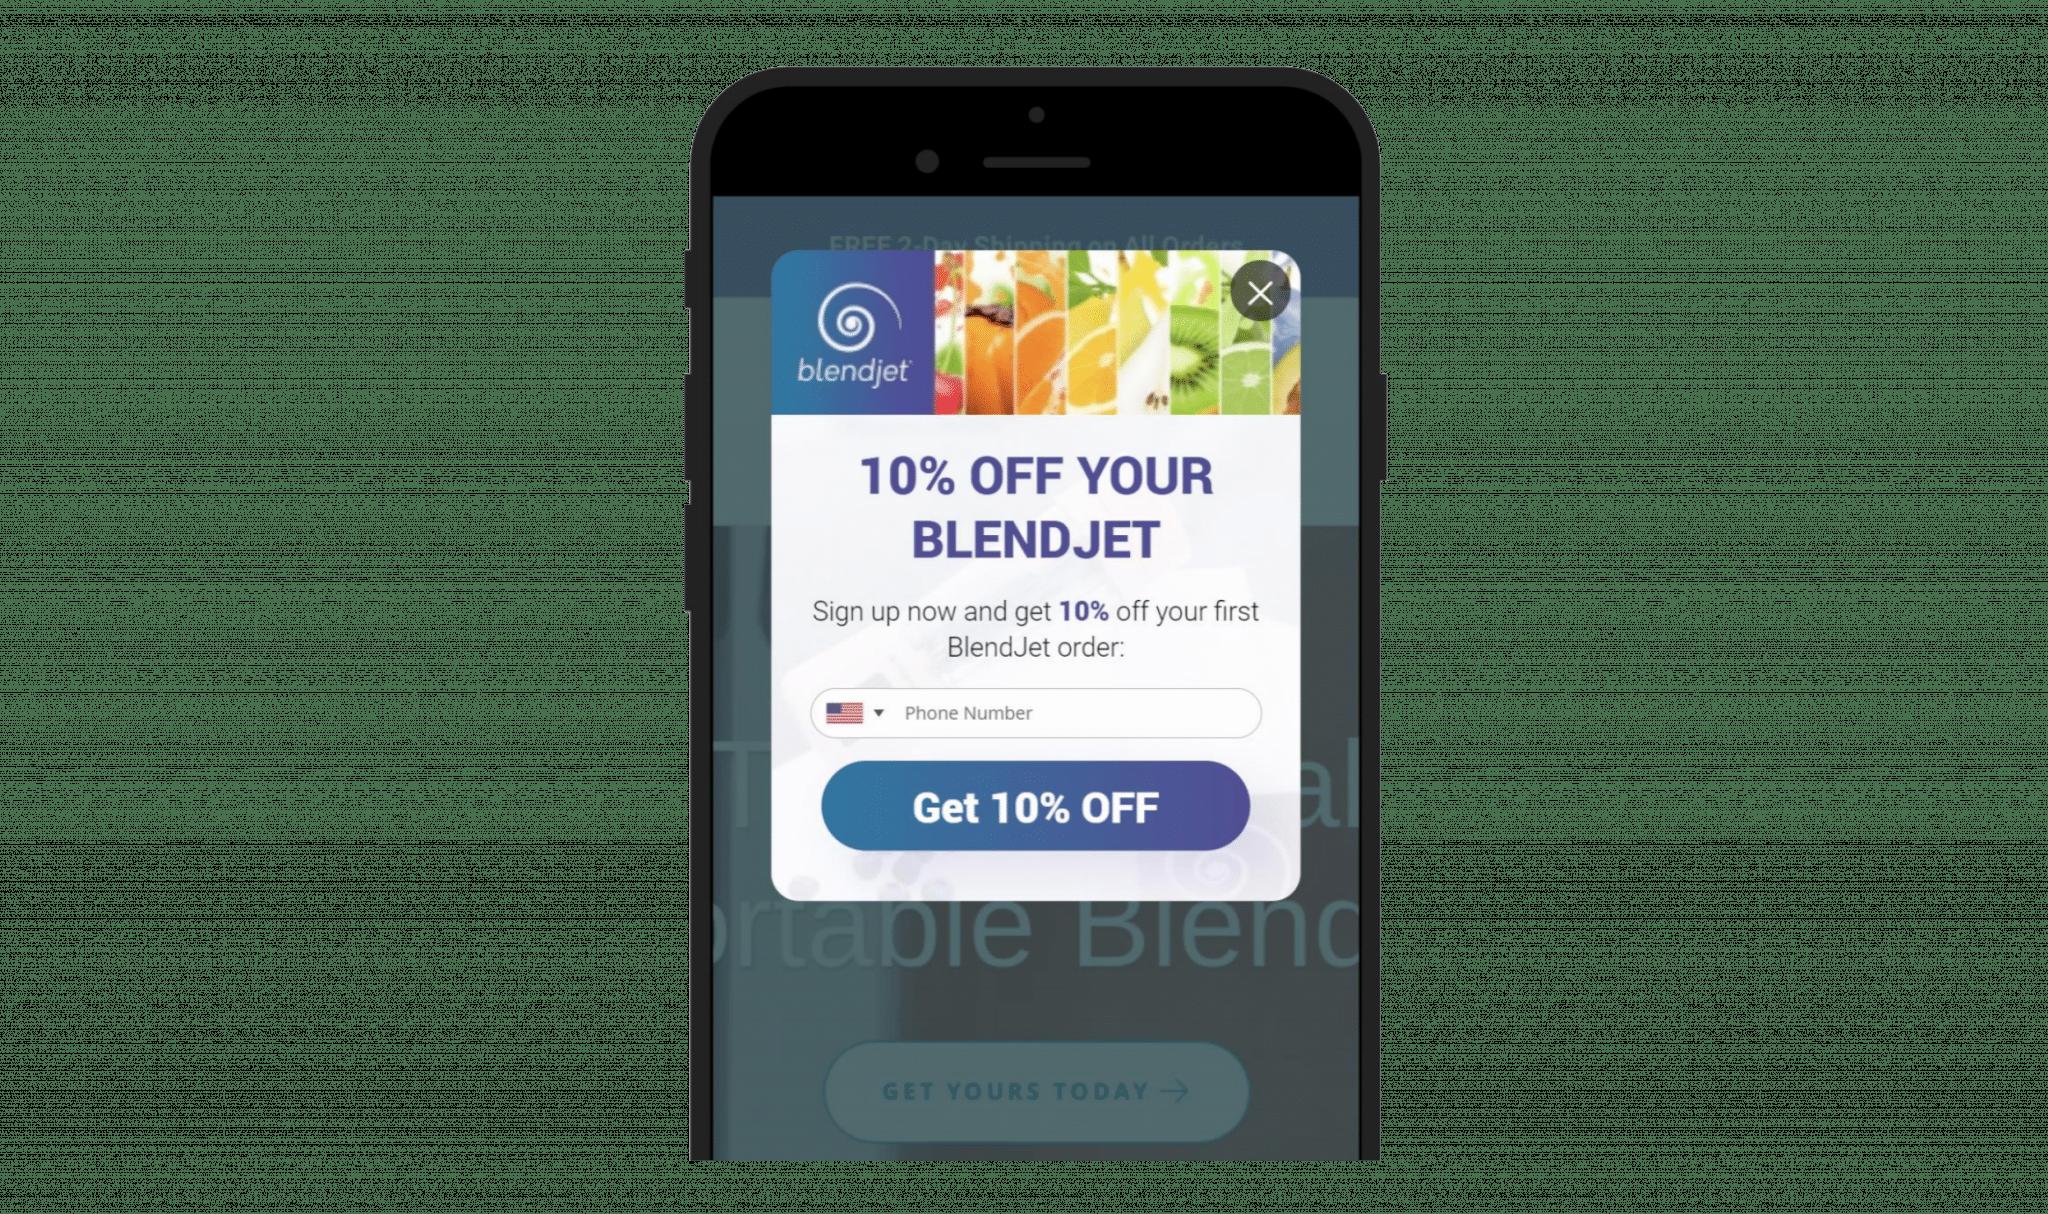 Optimonk_blendjet_mobile_popup_SMSBump